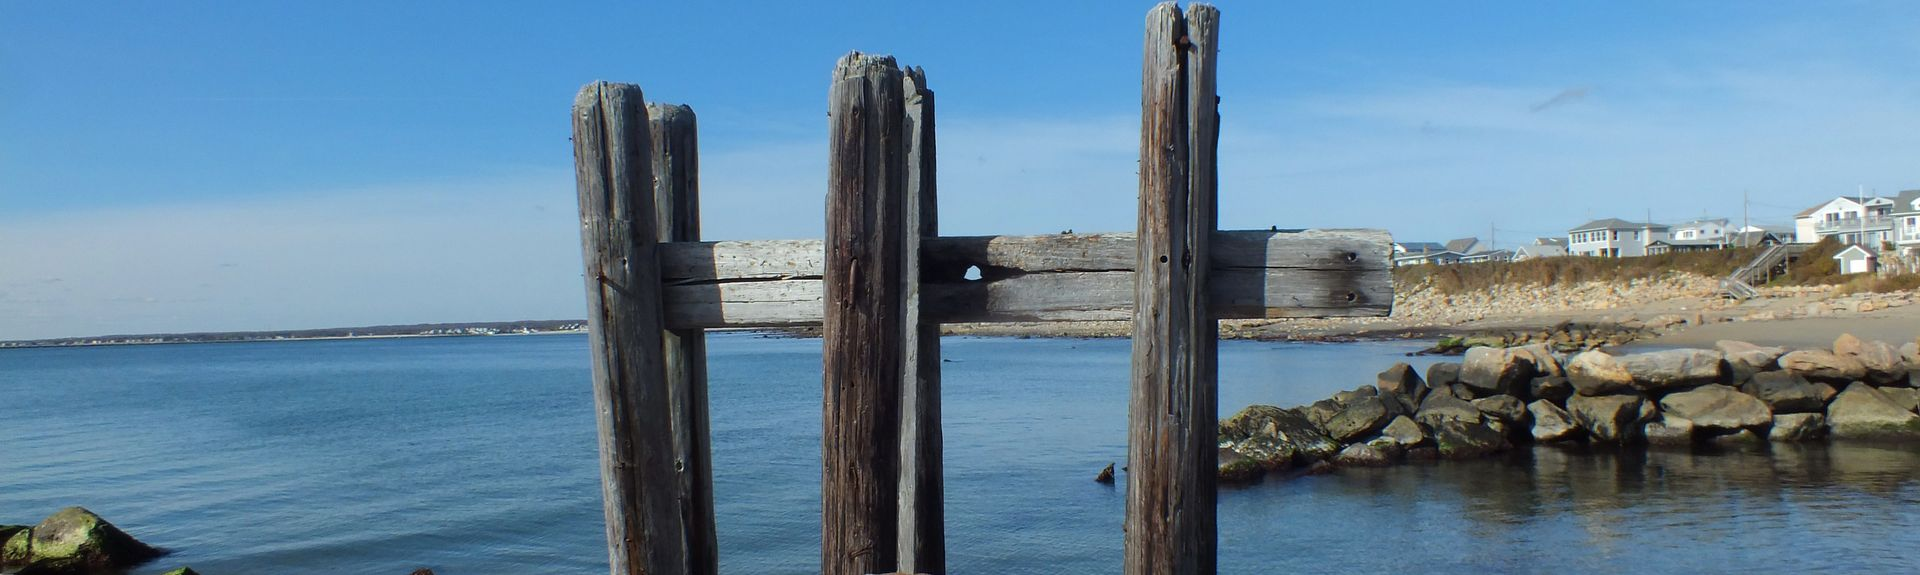 Breakwater Village, Narragansett, Rhode Island, United States of America